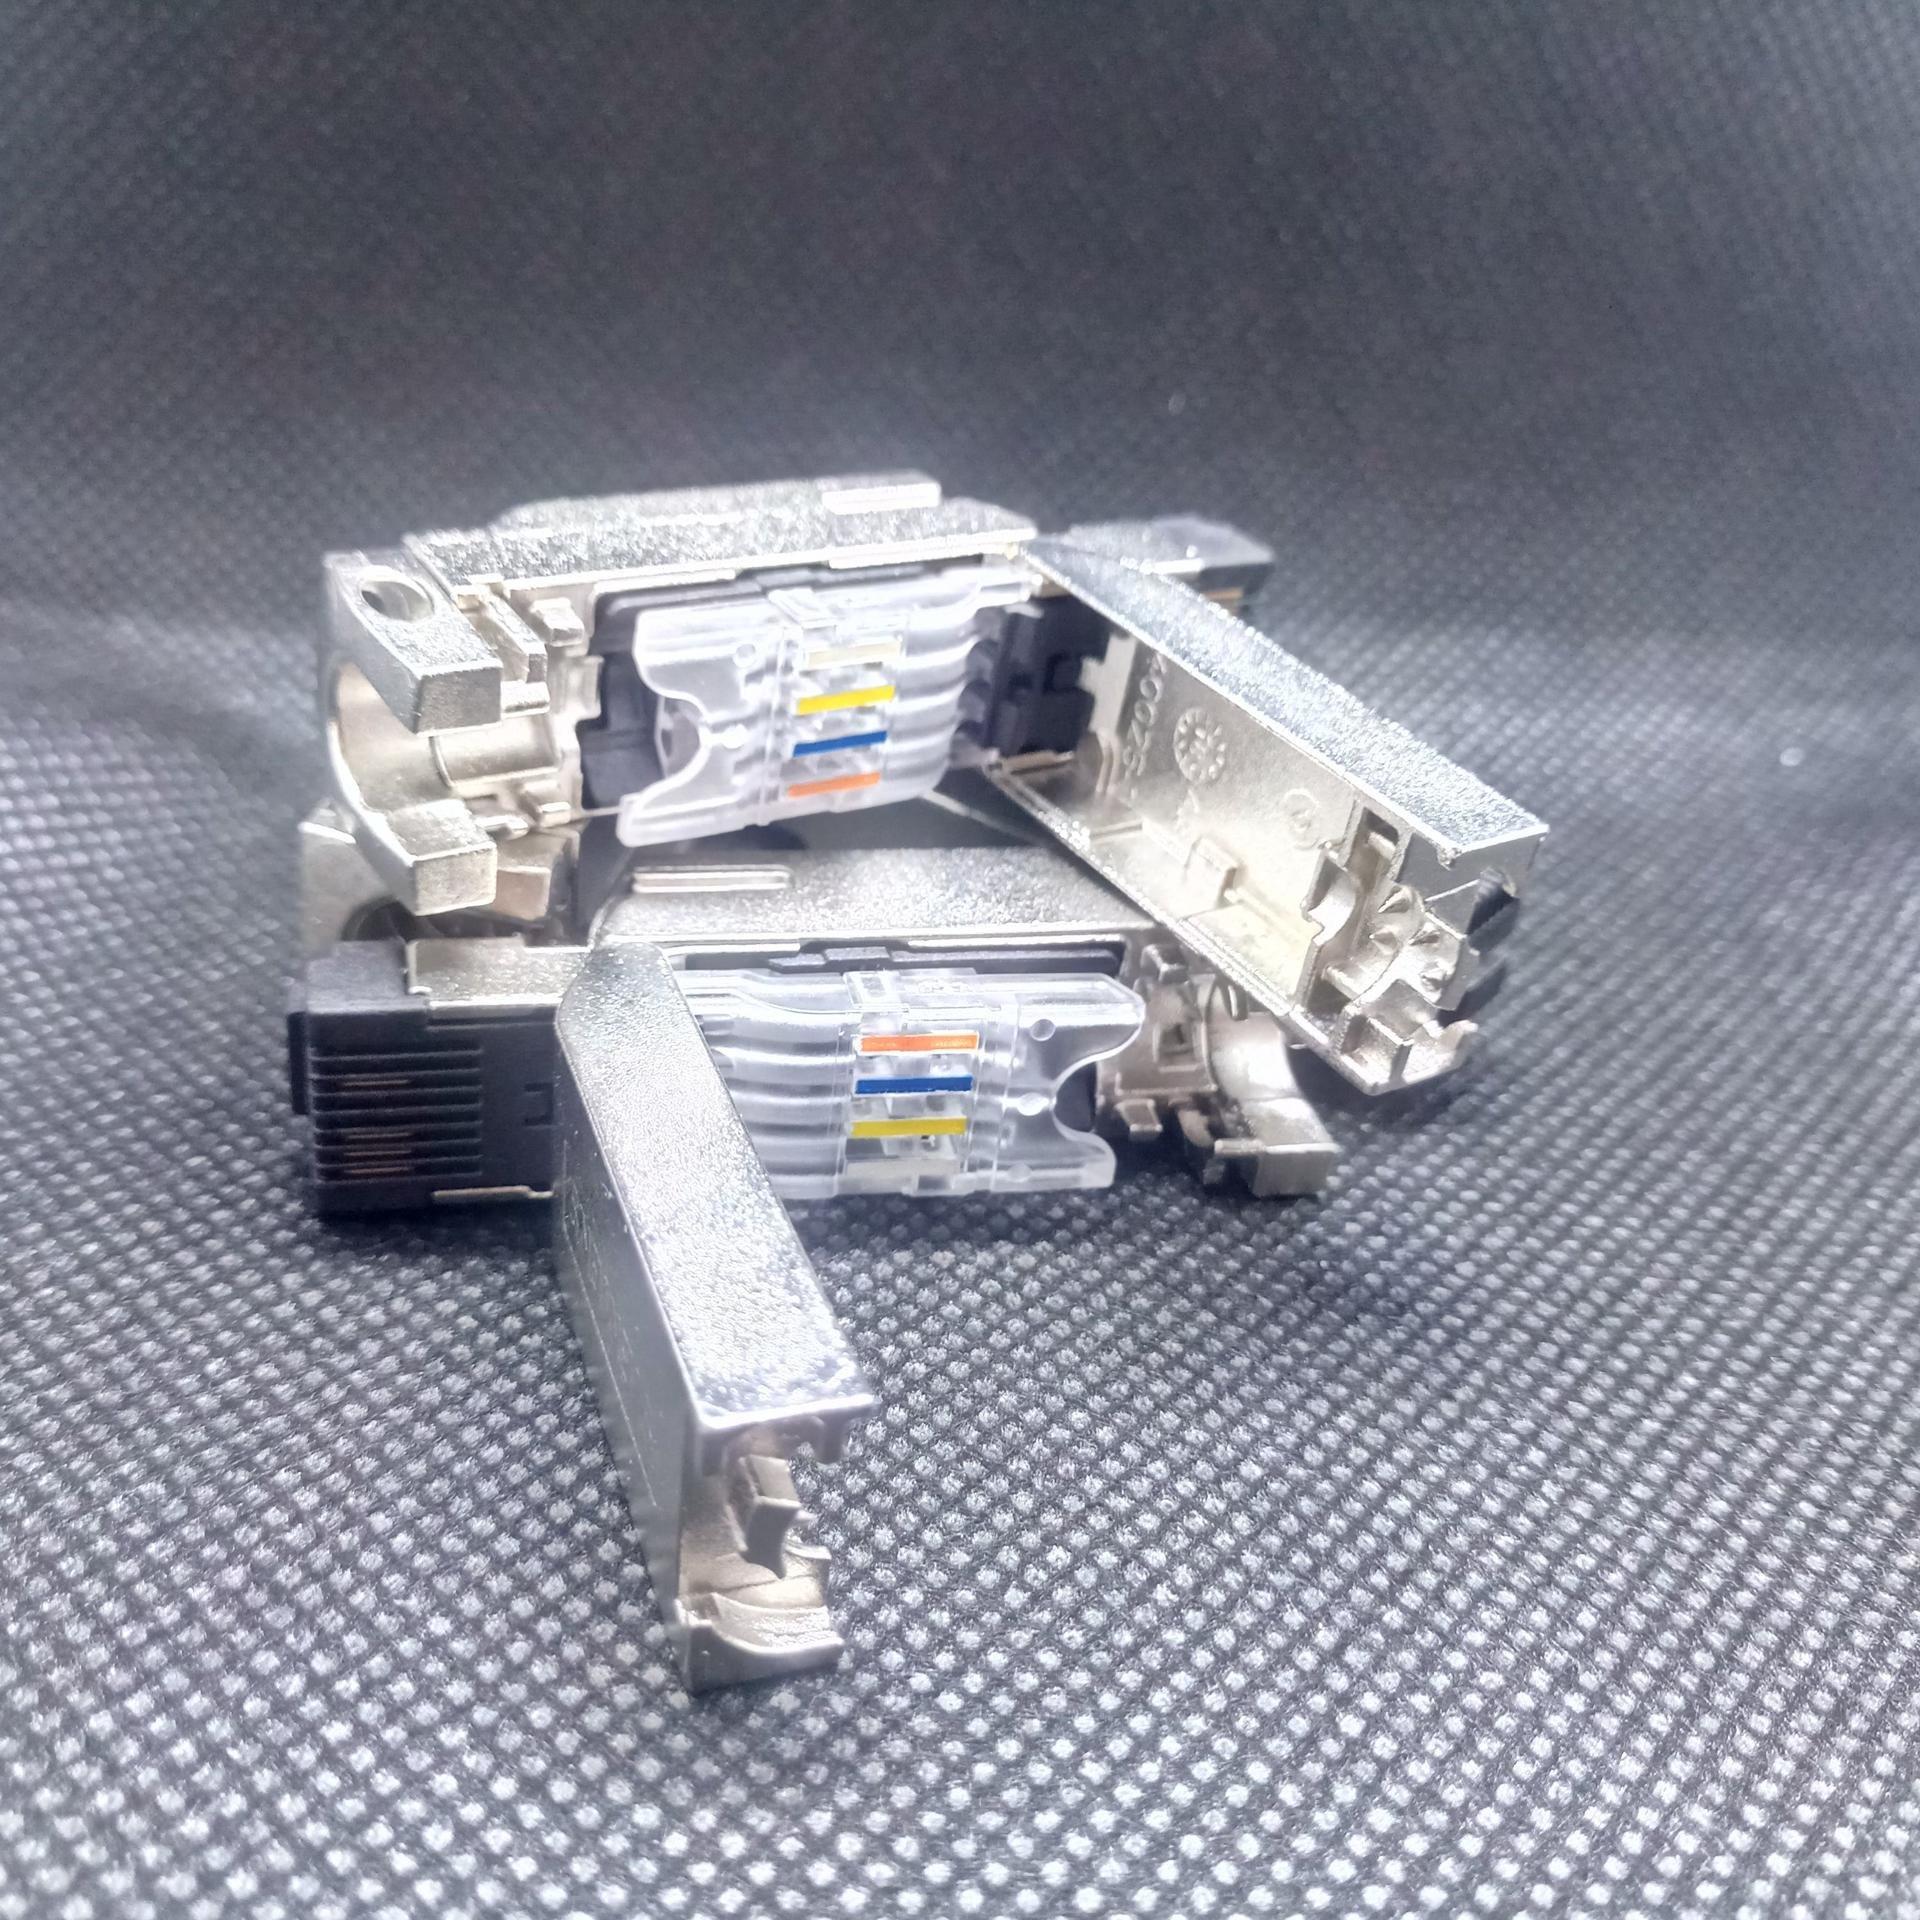 6GK19011BB102AA0,西门子RJ45水晶头,以太网线连接器,6GK1901-1BB10-2AA0